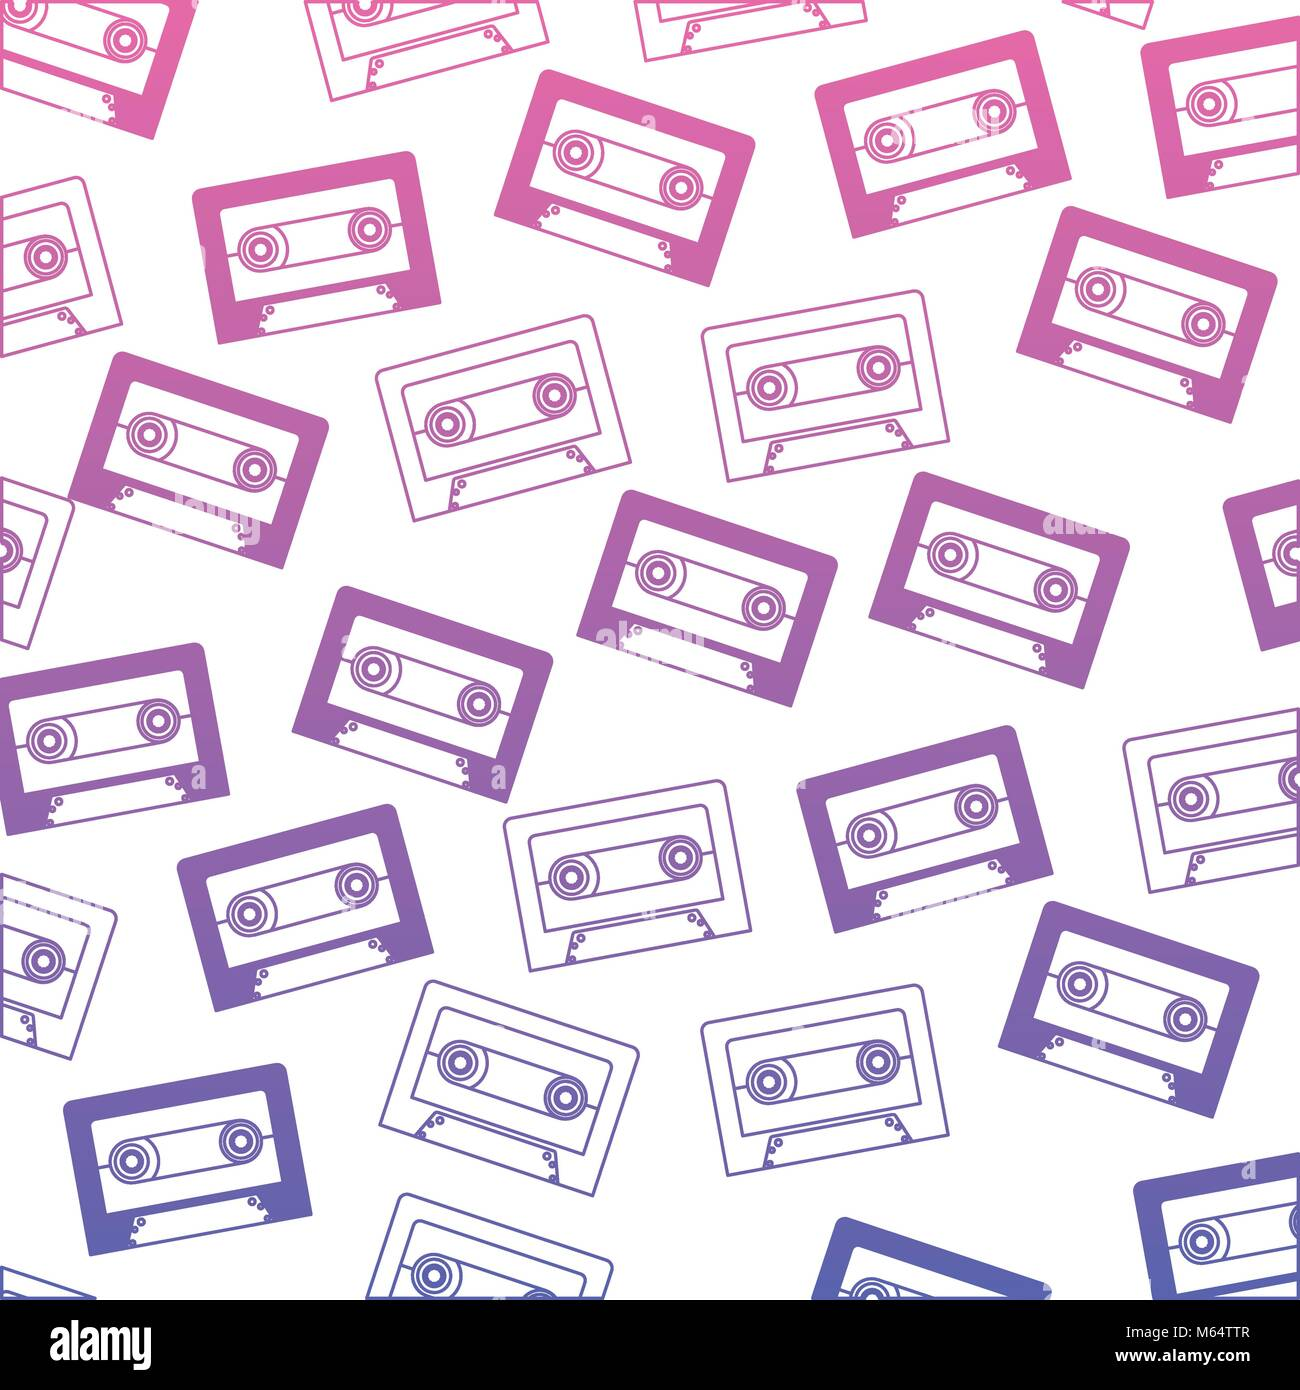 retro cassette pattern background - Stock Image